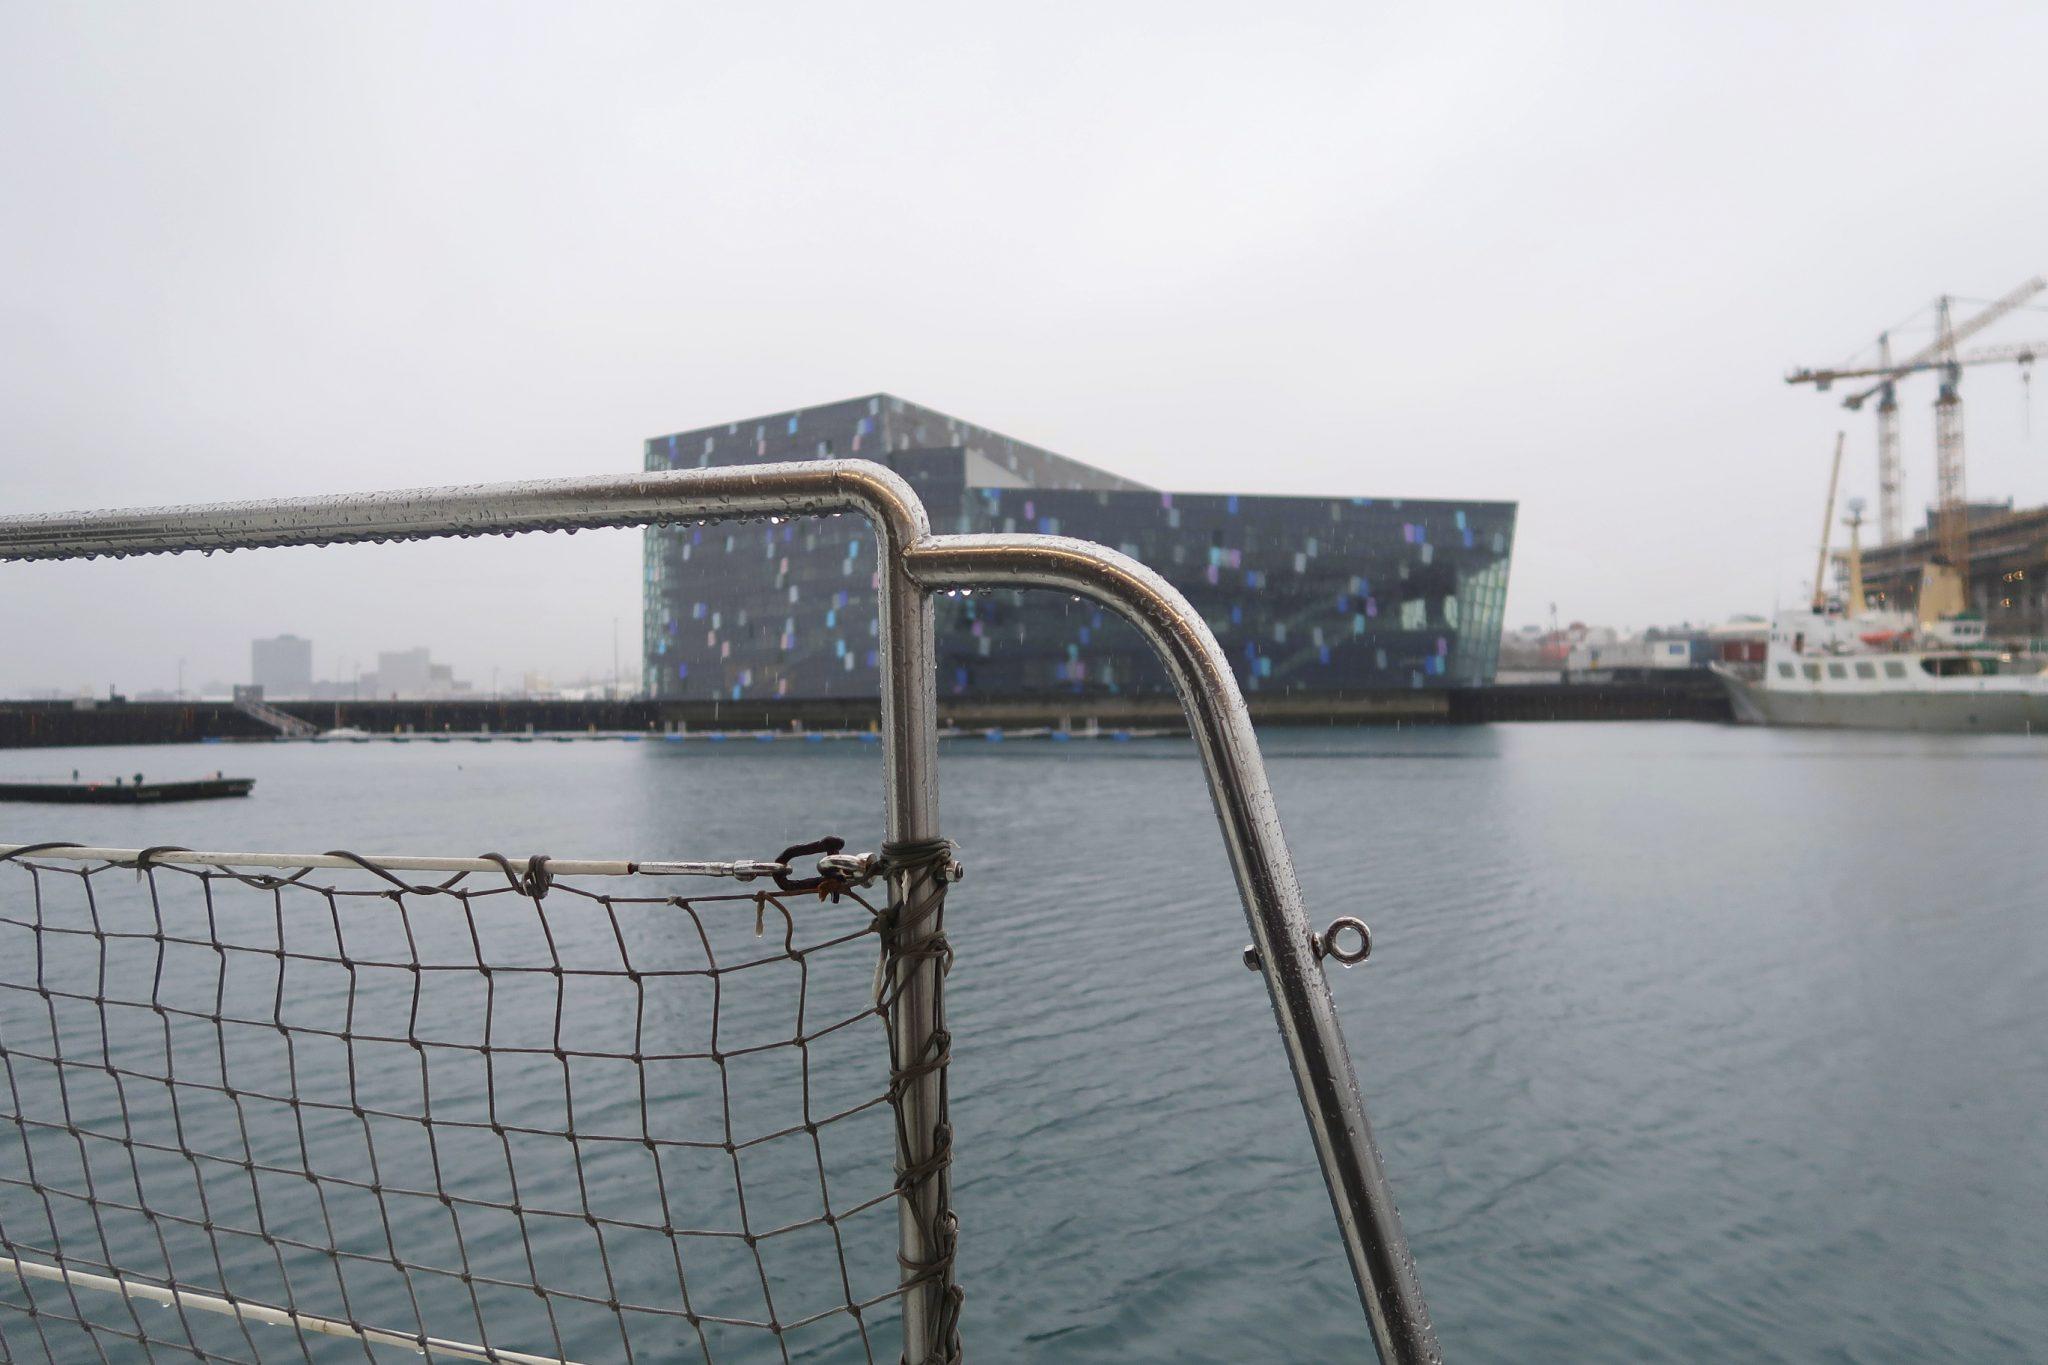 Reykjavik Harpa